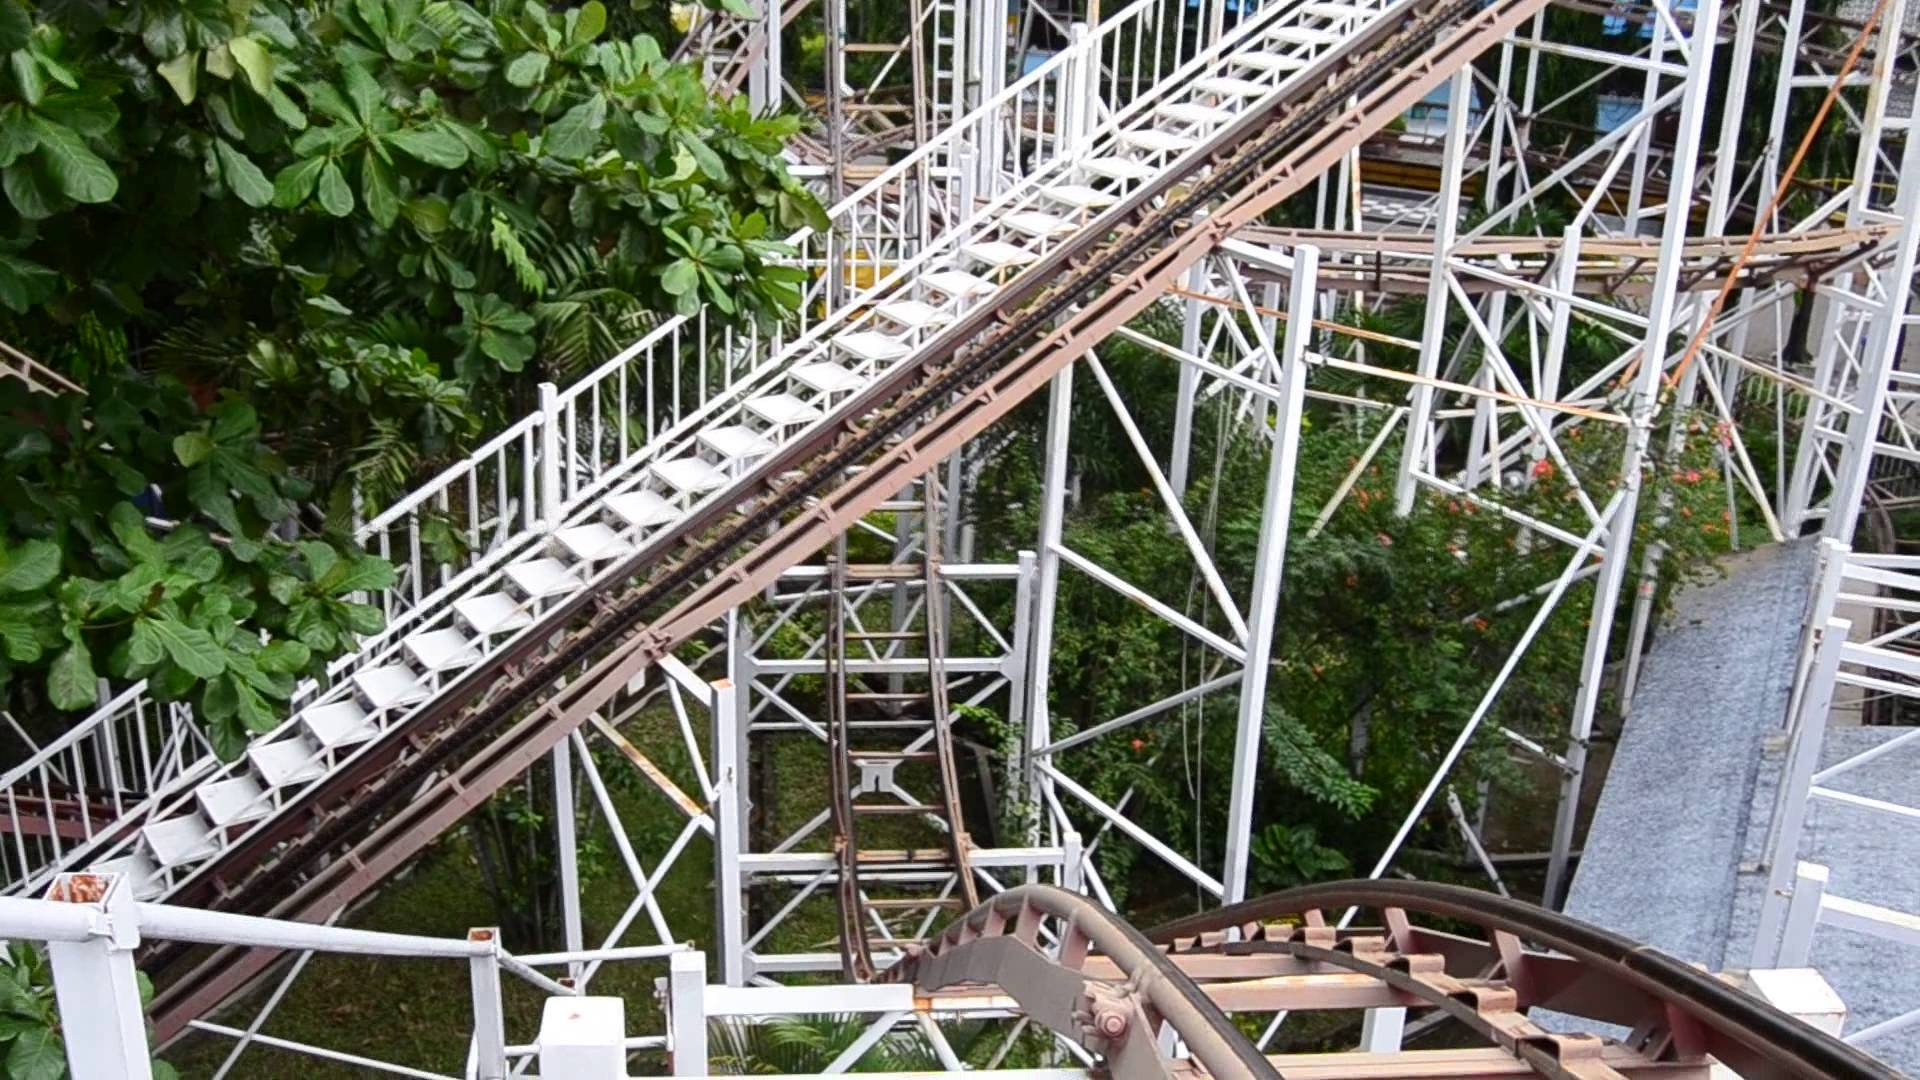 Roller Coaster Taman Remaja Surabaya Youtube Thr Hiburan Rakyat Kota